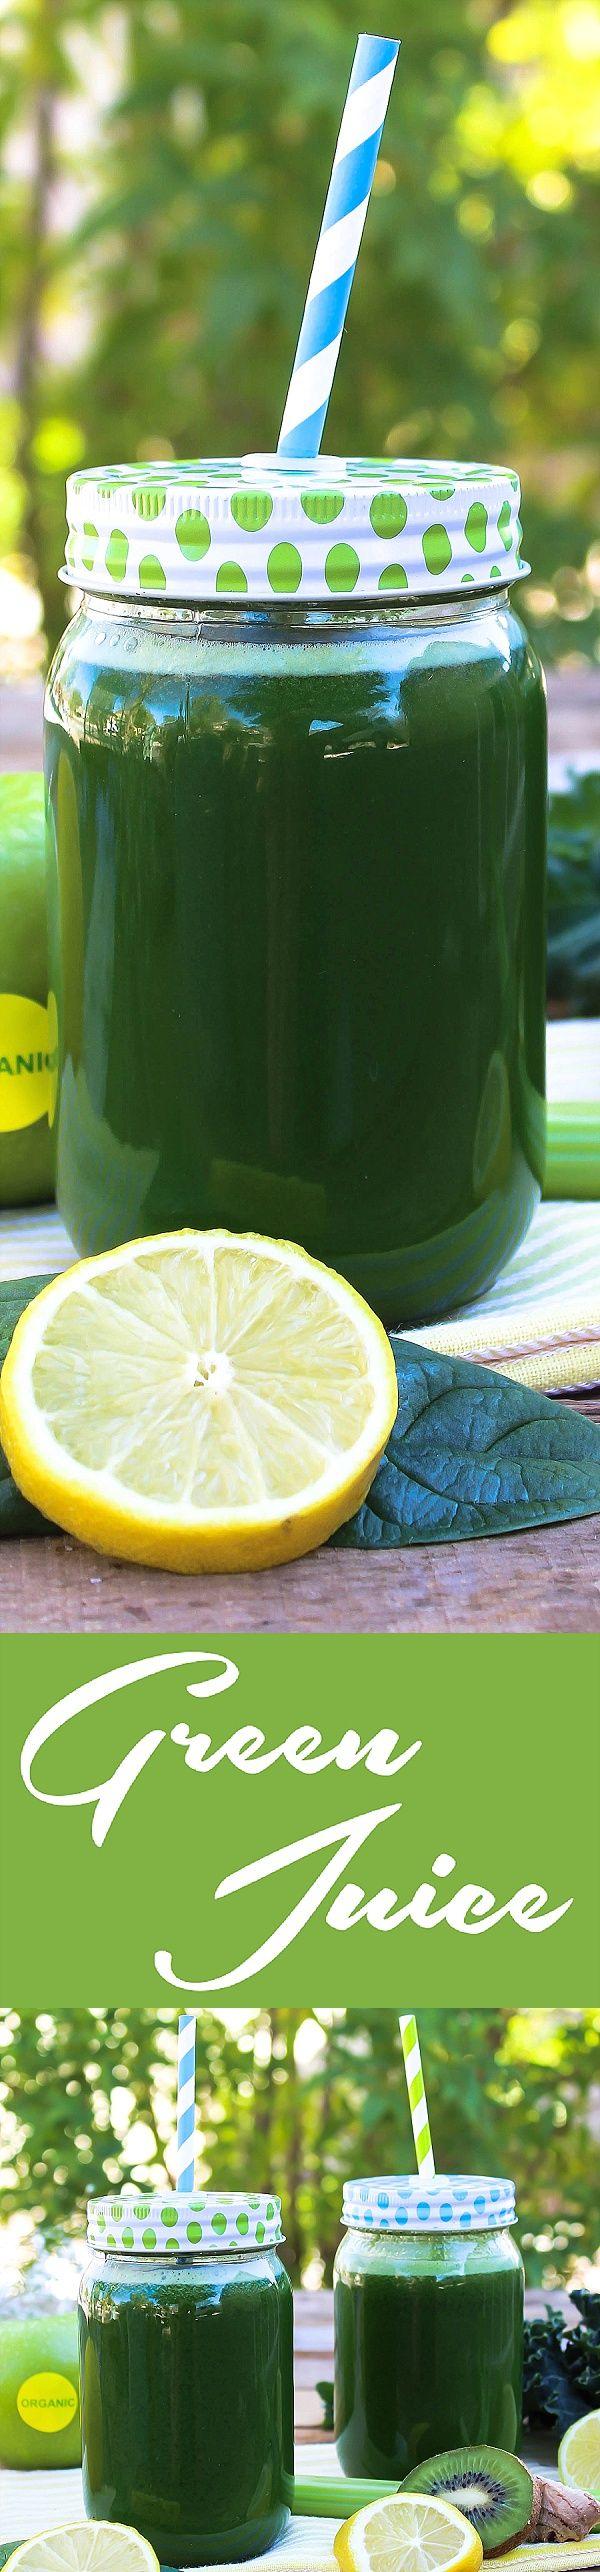 Raw Green Monster Juice - http://veganhuggs.com/classic-green-juice/